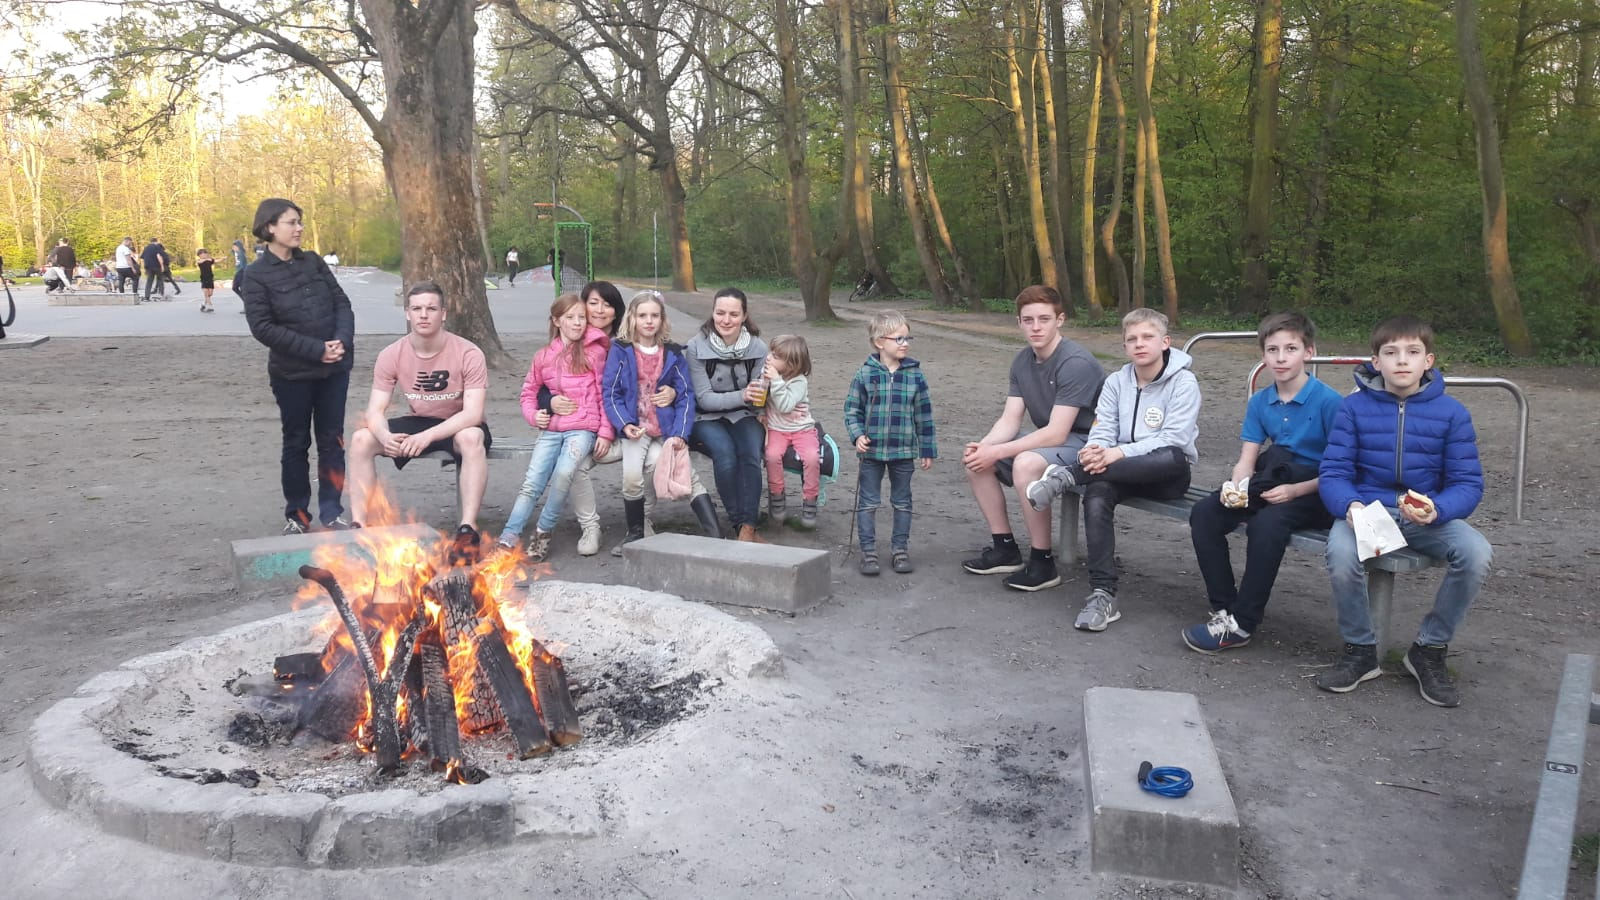 JCL Osterfeuer im Clara-Zetkin-Park